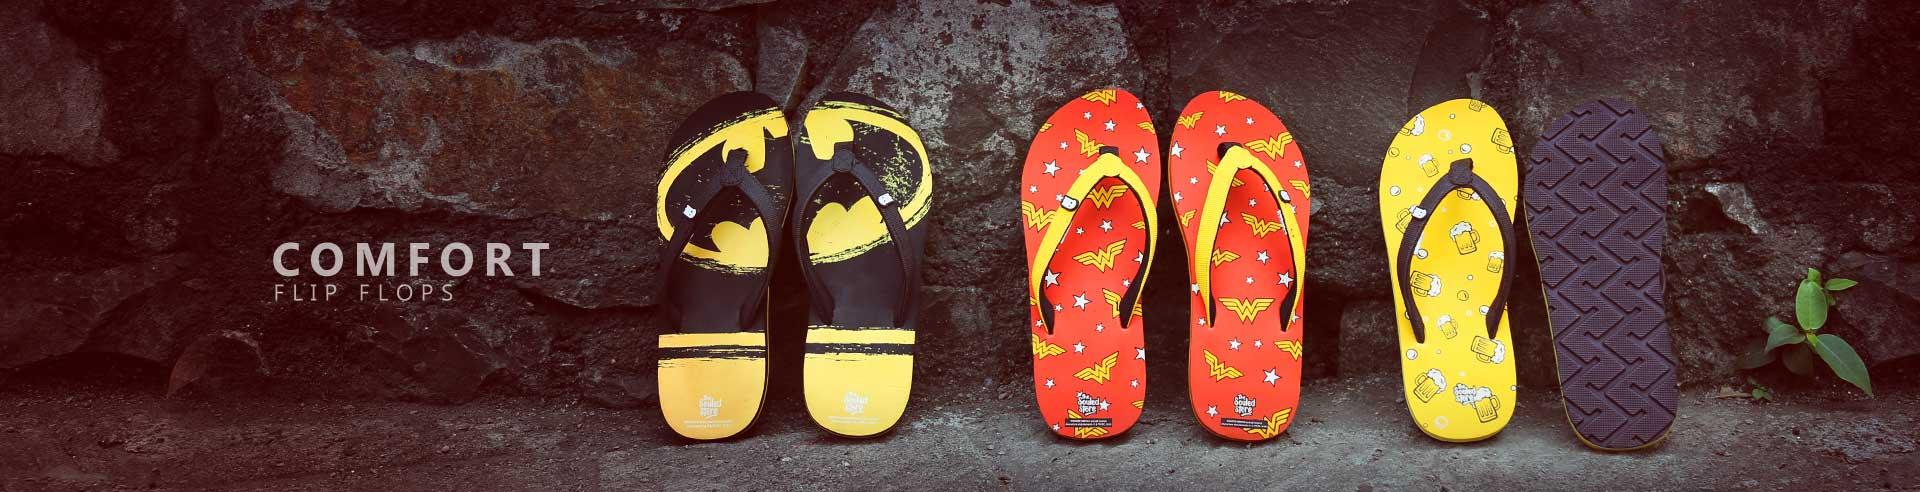 Buy Flip Flops   Slippers For Men   Women Online only at The Souled Store 44f20c949cfa